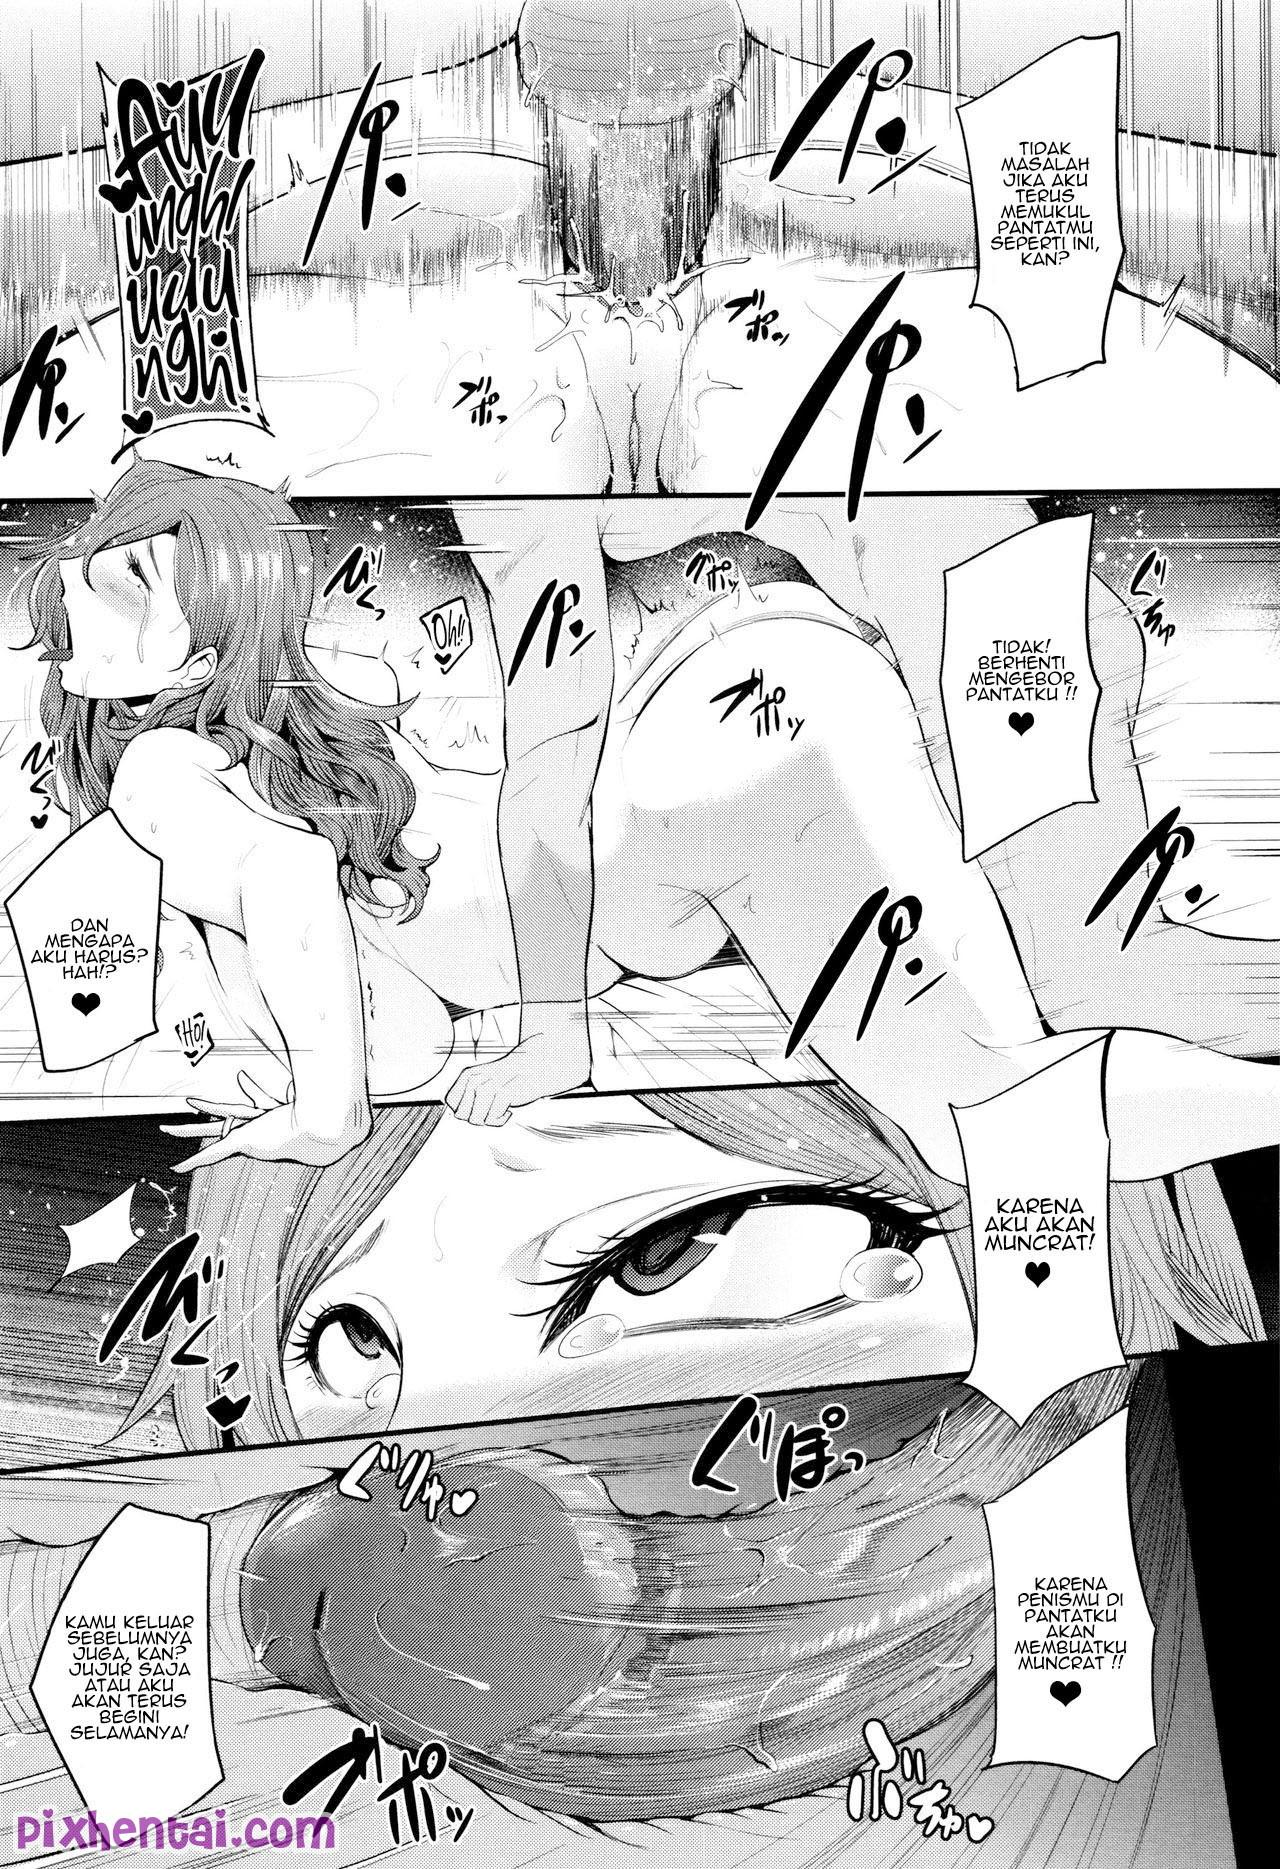 Komik hentai xxx manga sex bokep daya tarik seks teman-teman ibu 27